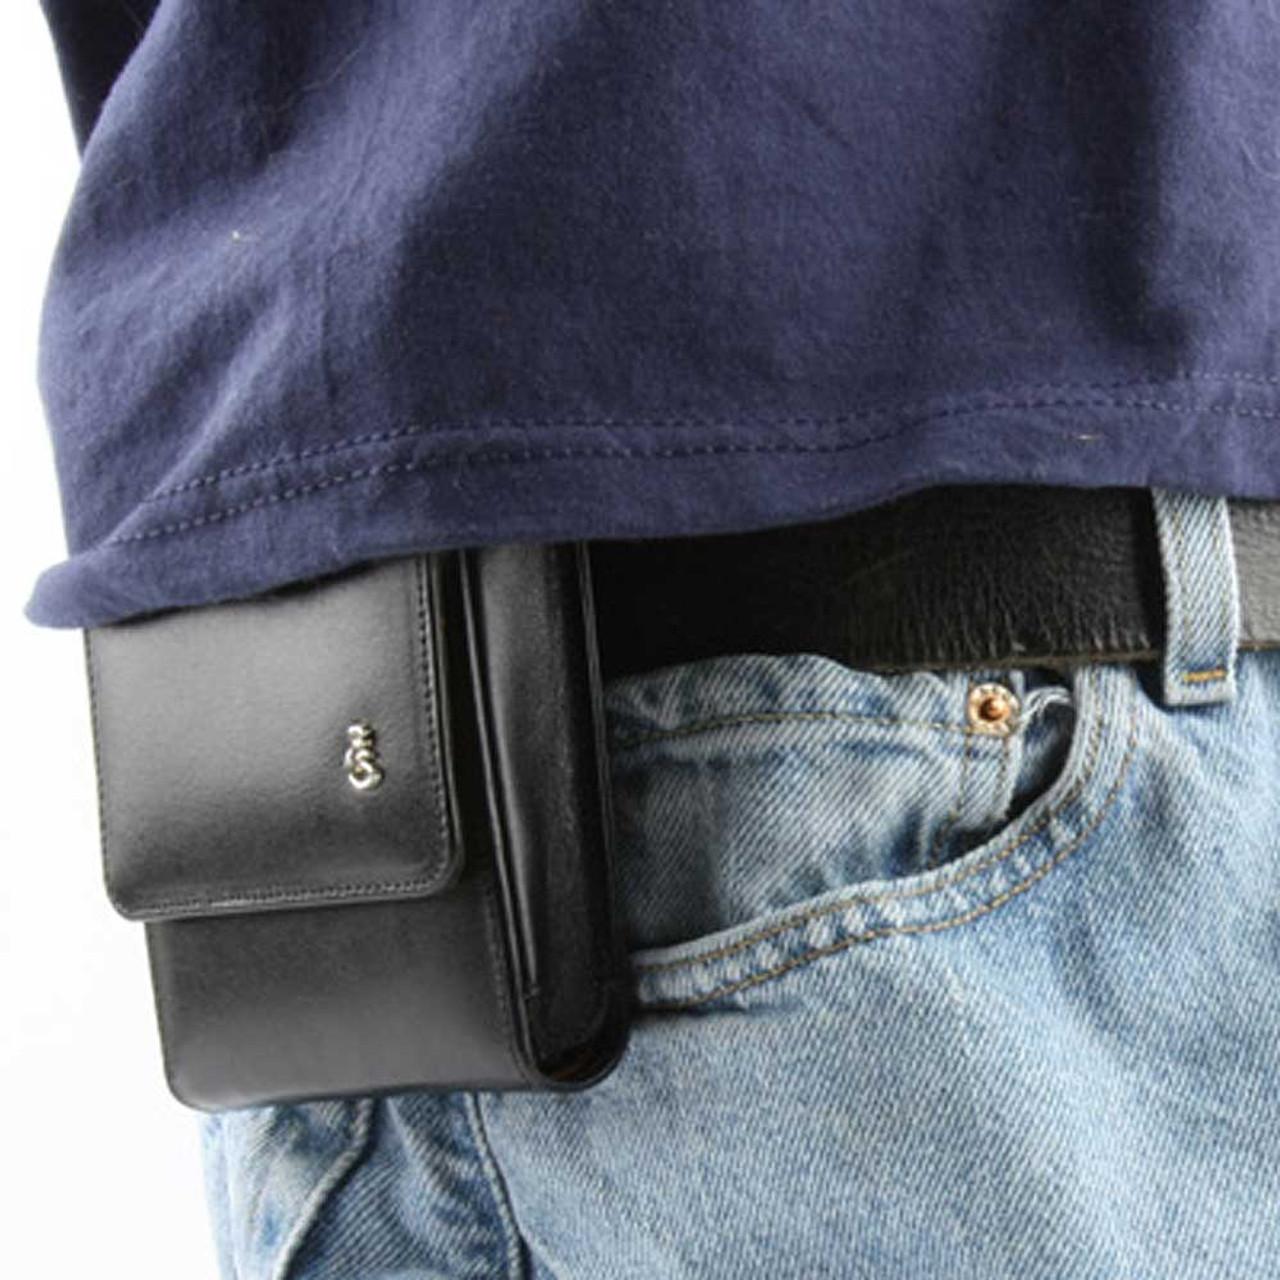 M&P 40c Sneaky Pete Holster (Belt Clip)